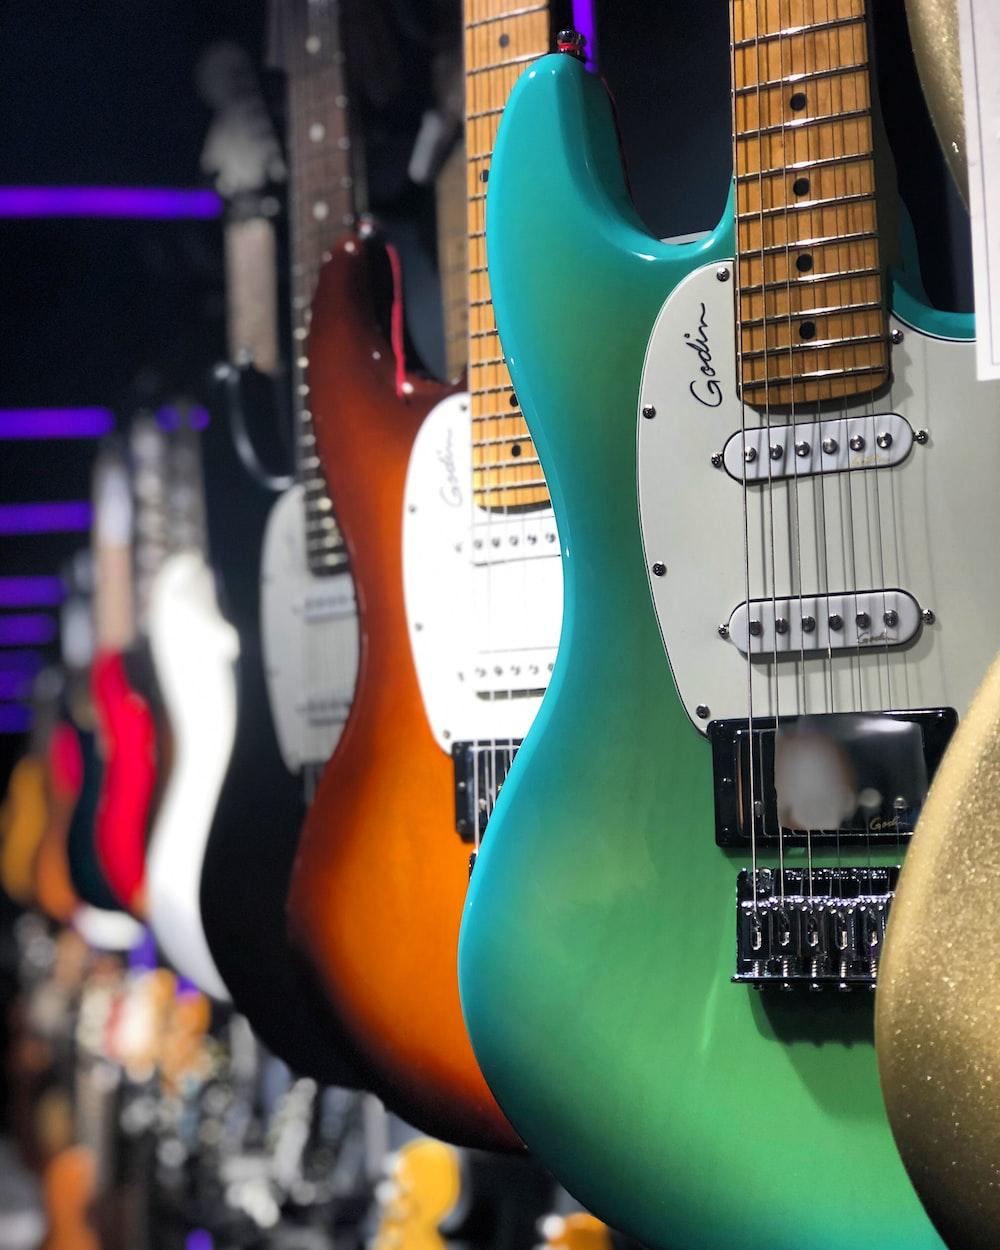 white and orange electric guitars